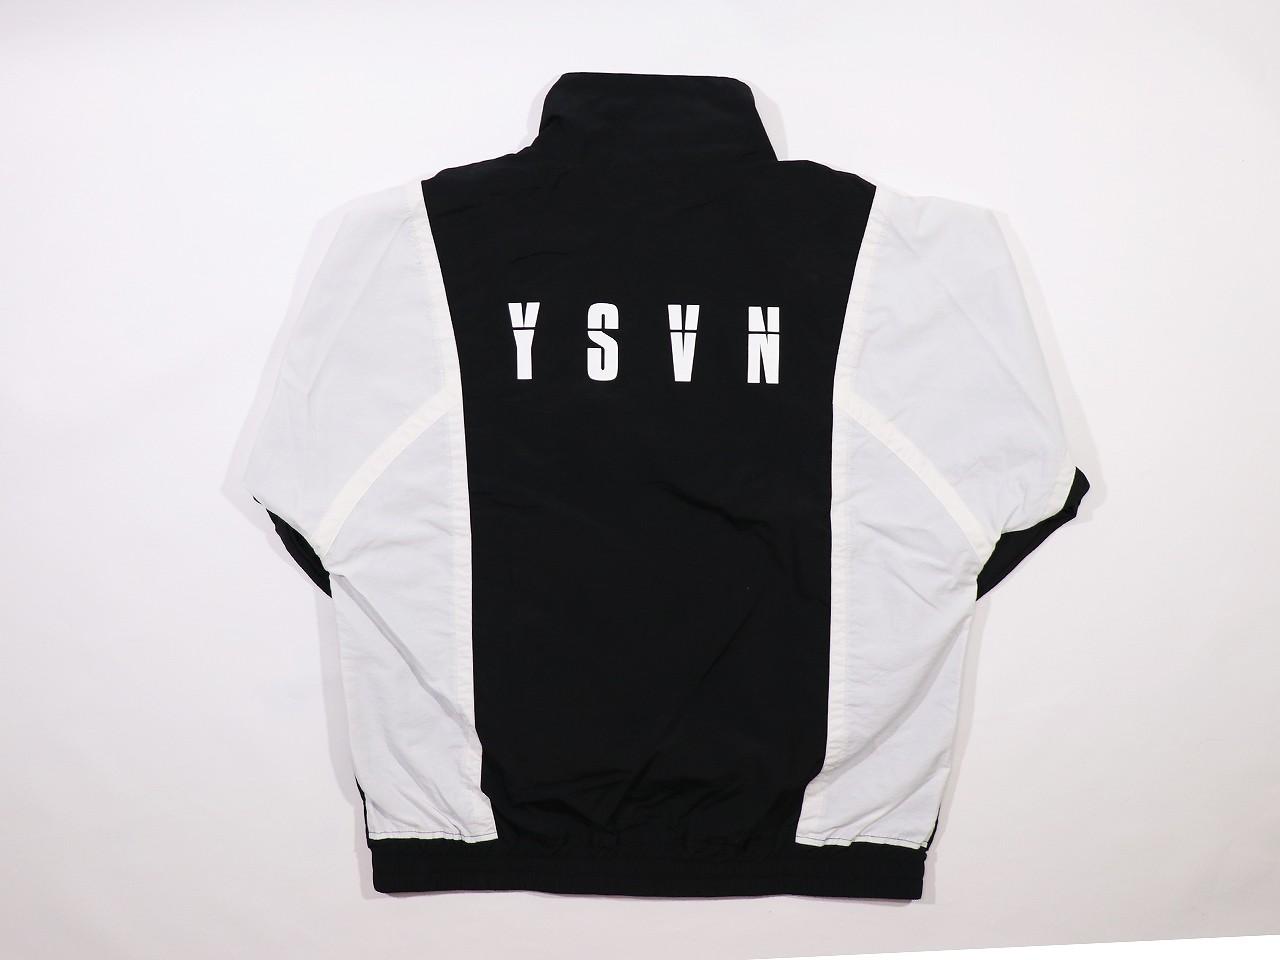 YSVN-ナイロンジャケット